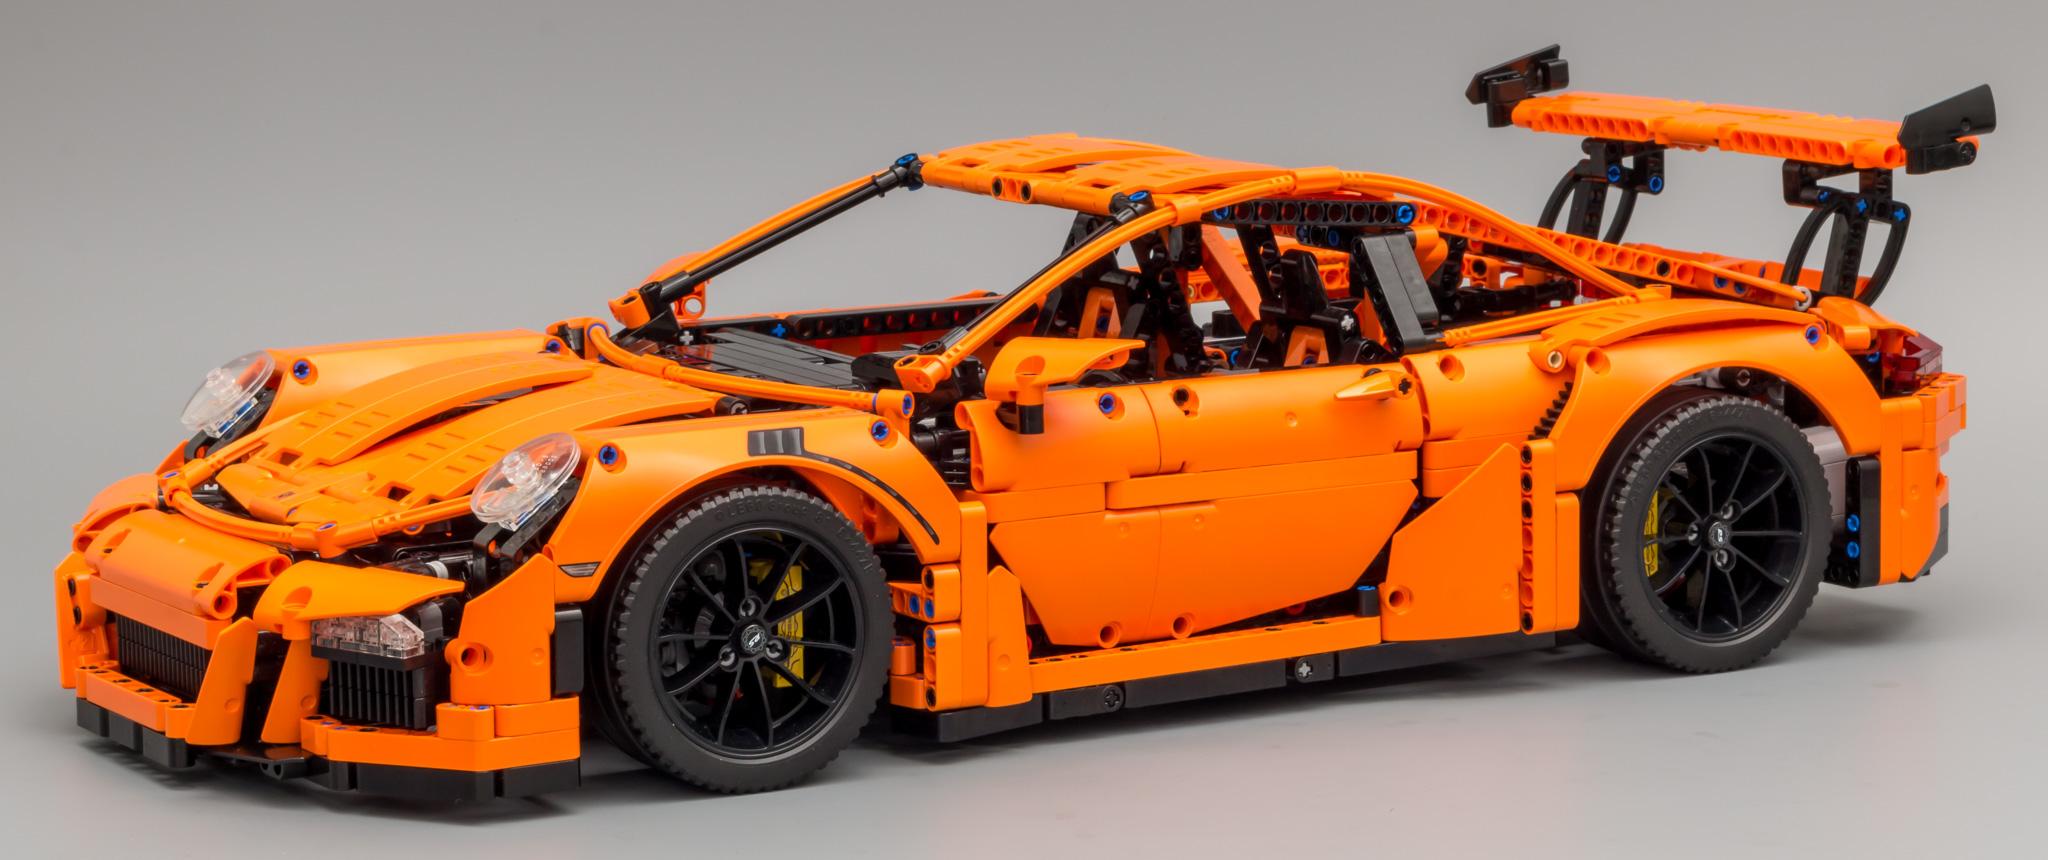 review 42056 porsche 911 gt3 rs lego technic. Black Bedroom Furniture Sets. Home Design Ideas